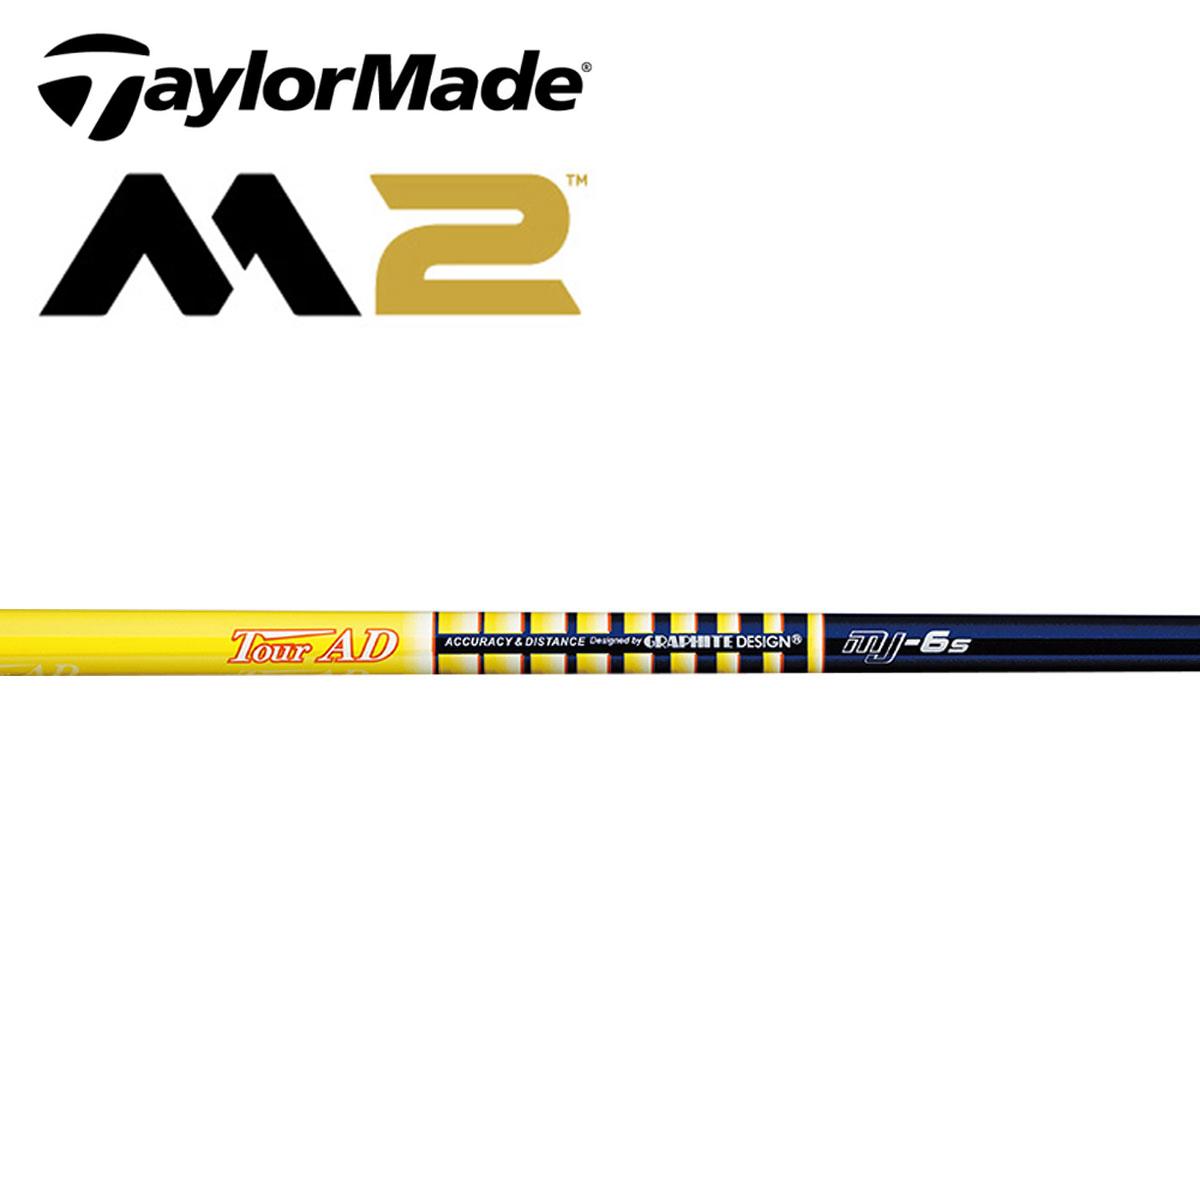 Tour AD MJシリーズ M2 ドライバーロフト10.5度用スリーブ付きシャフト 2016年モデル【テーラーメイド専用】